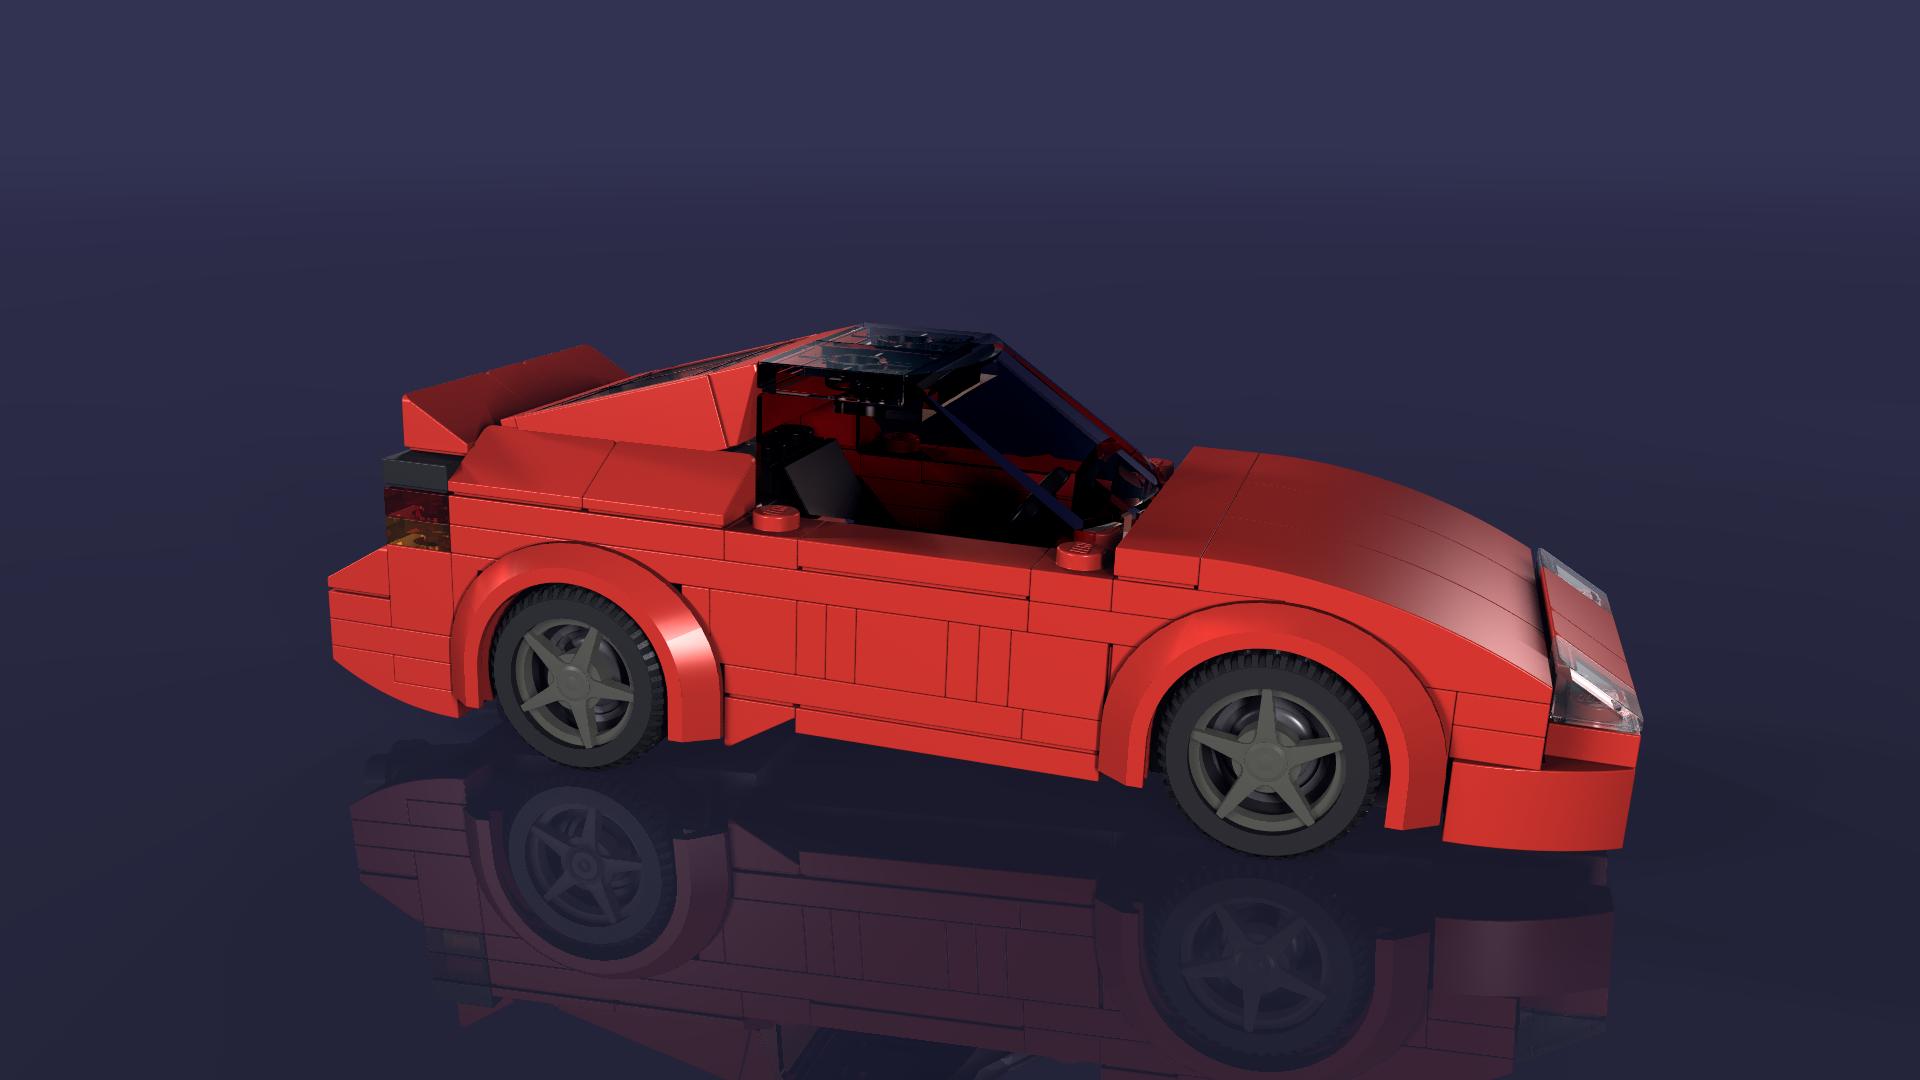 SC-type Nissan Fairlady Z32